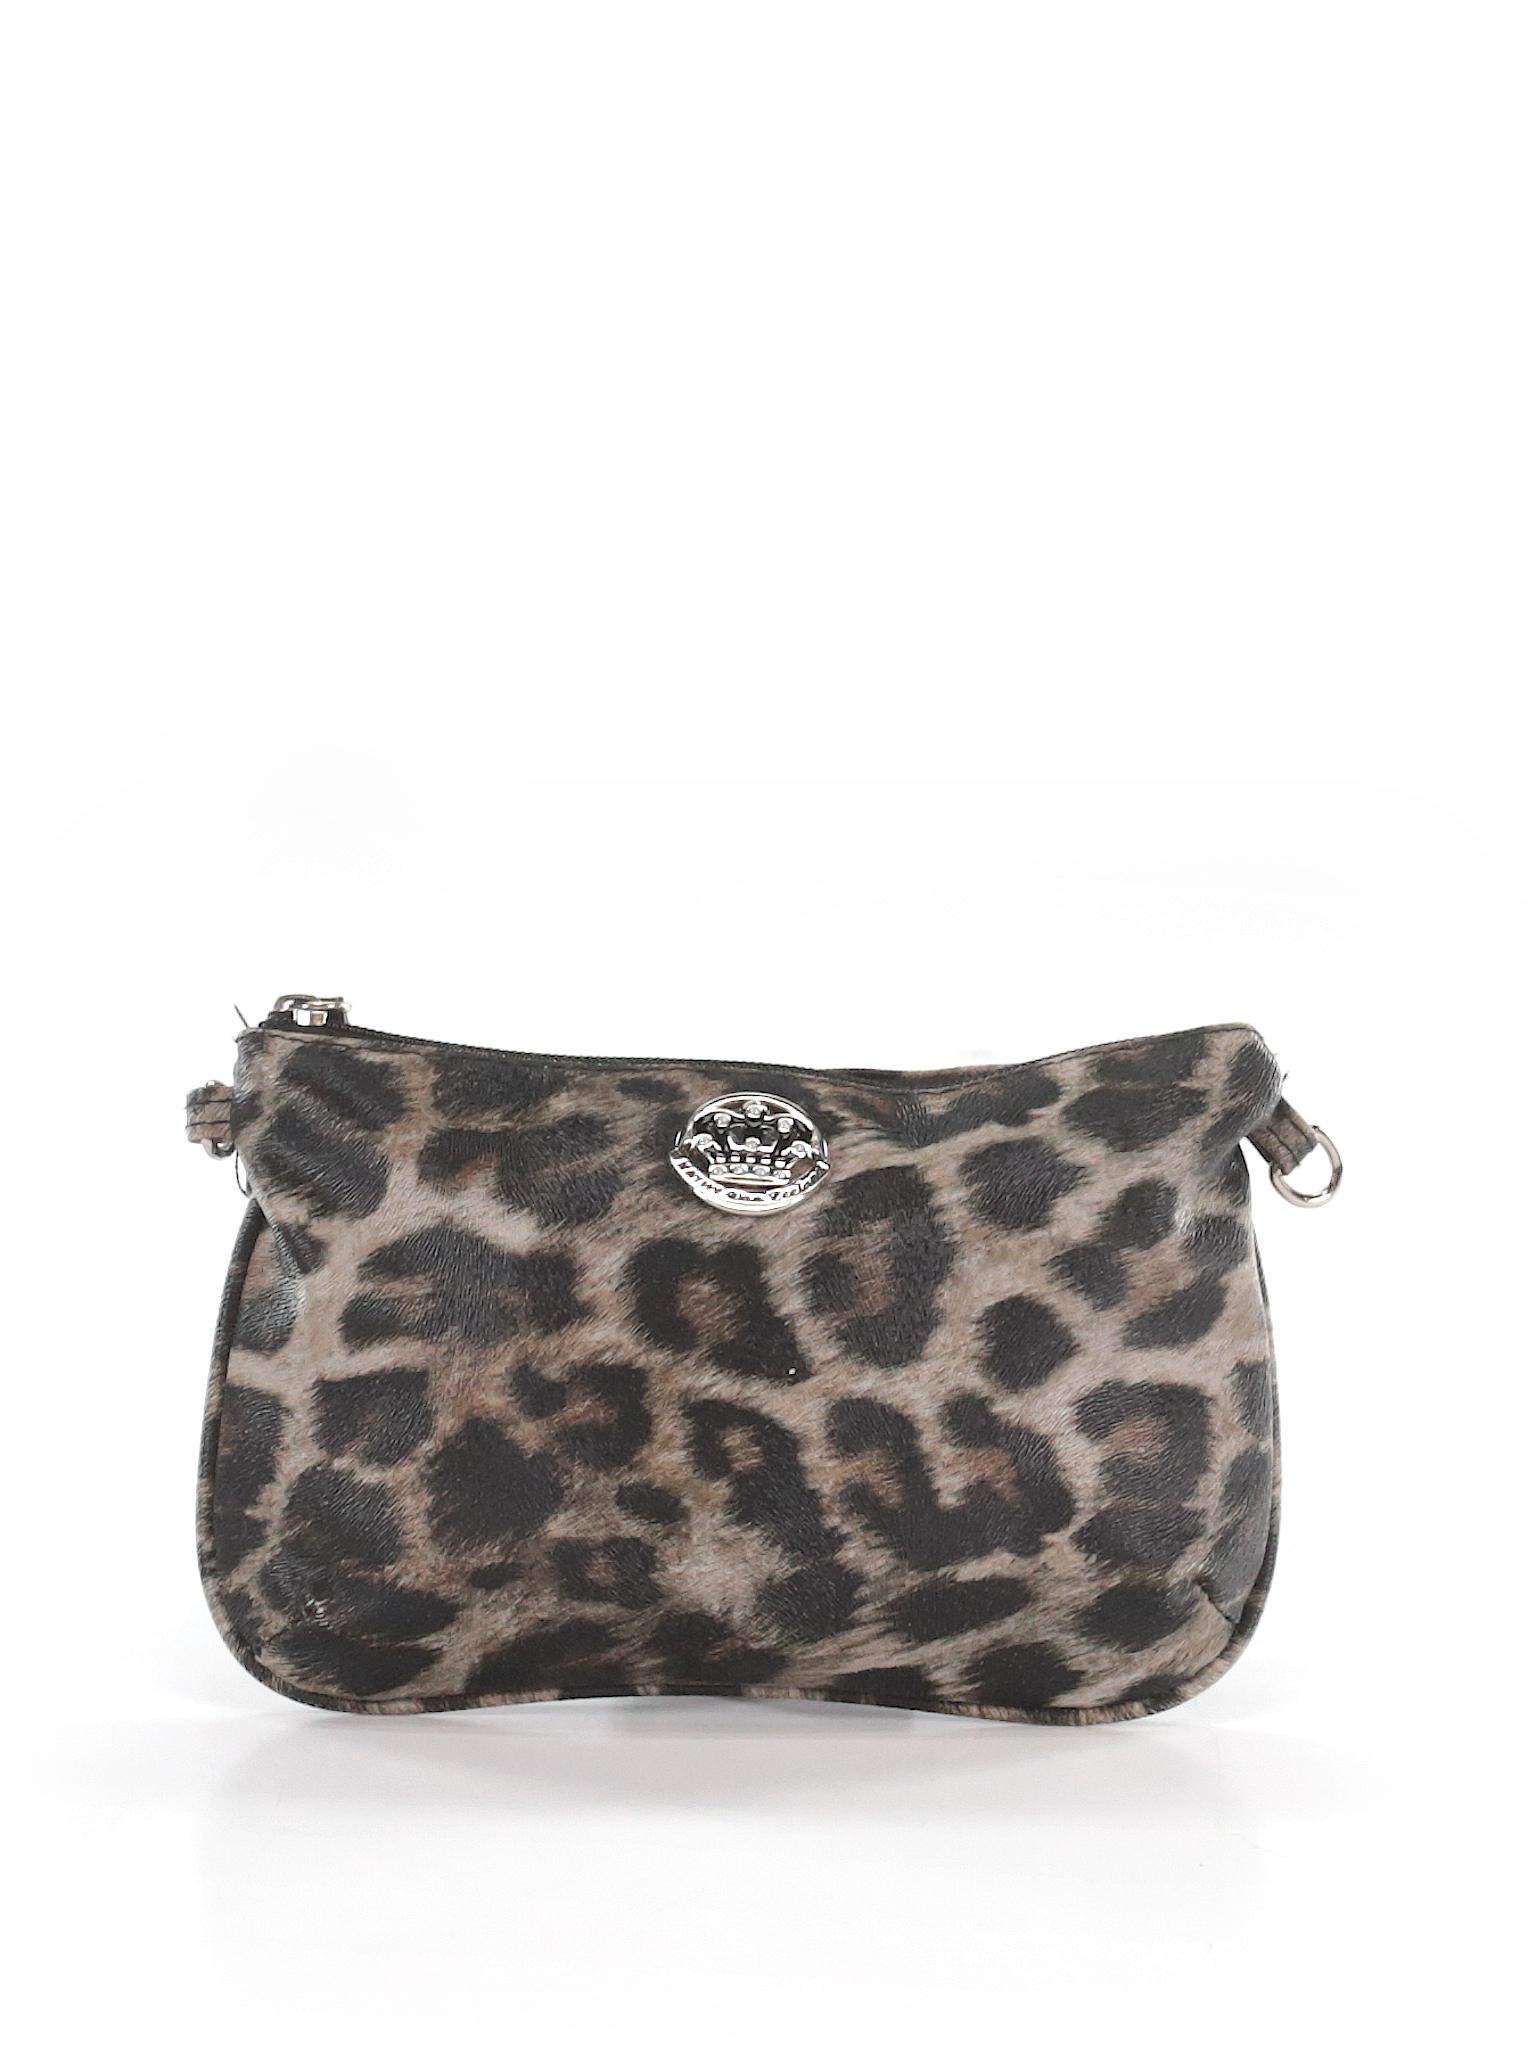 5958af633ad Kathy Van Zeeland Clutches On Sale Up To 90% Off Retail   thredUP